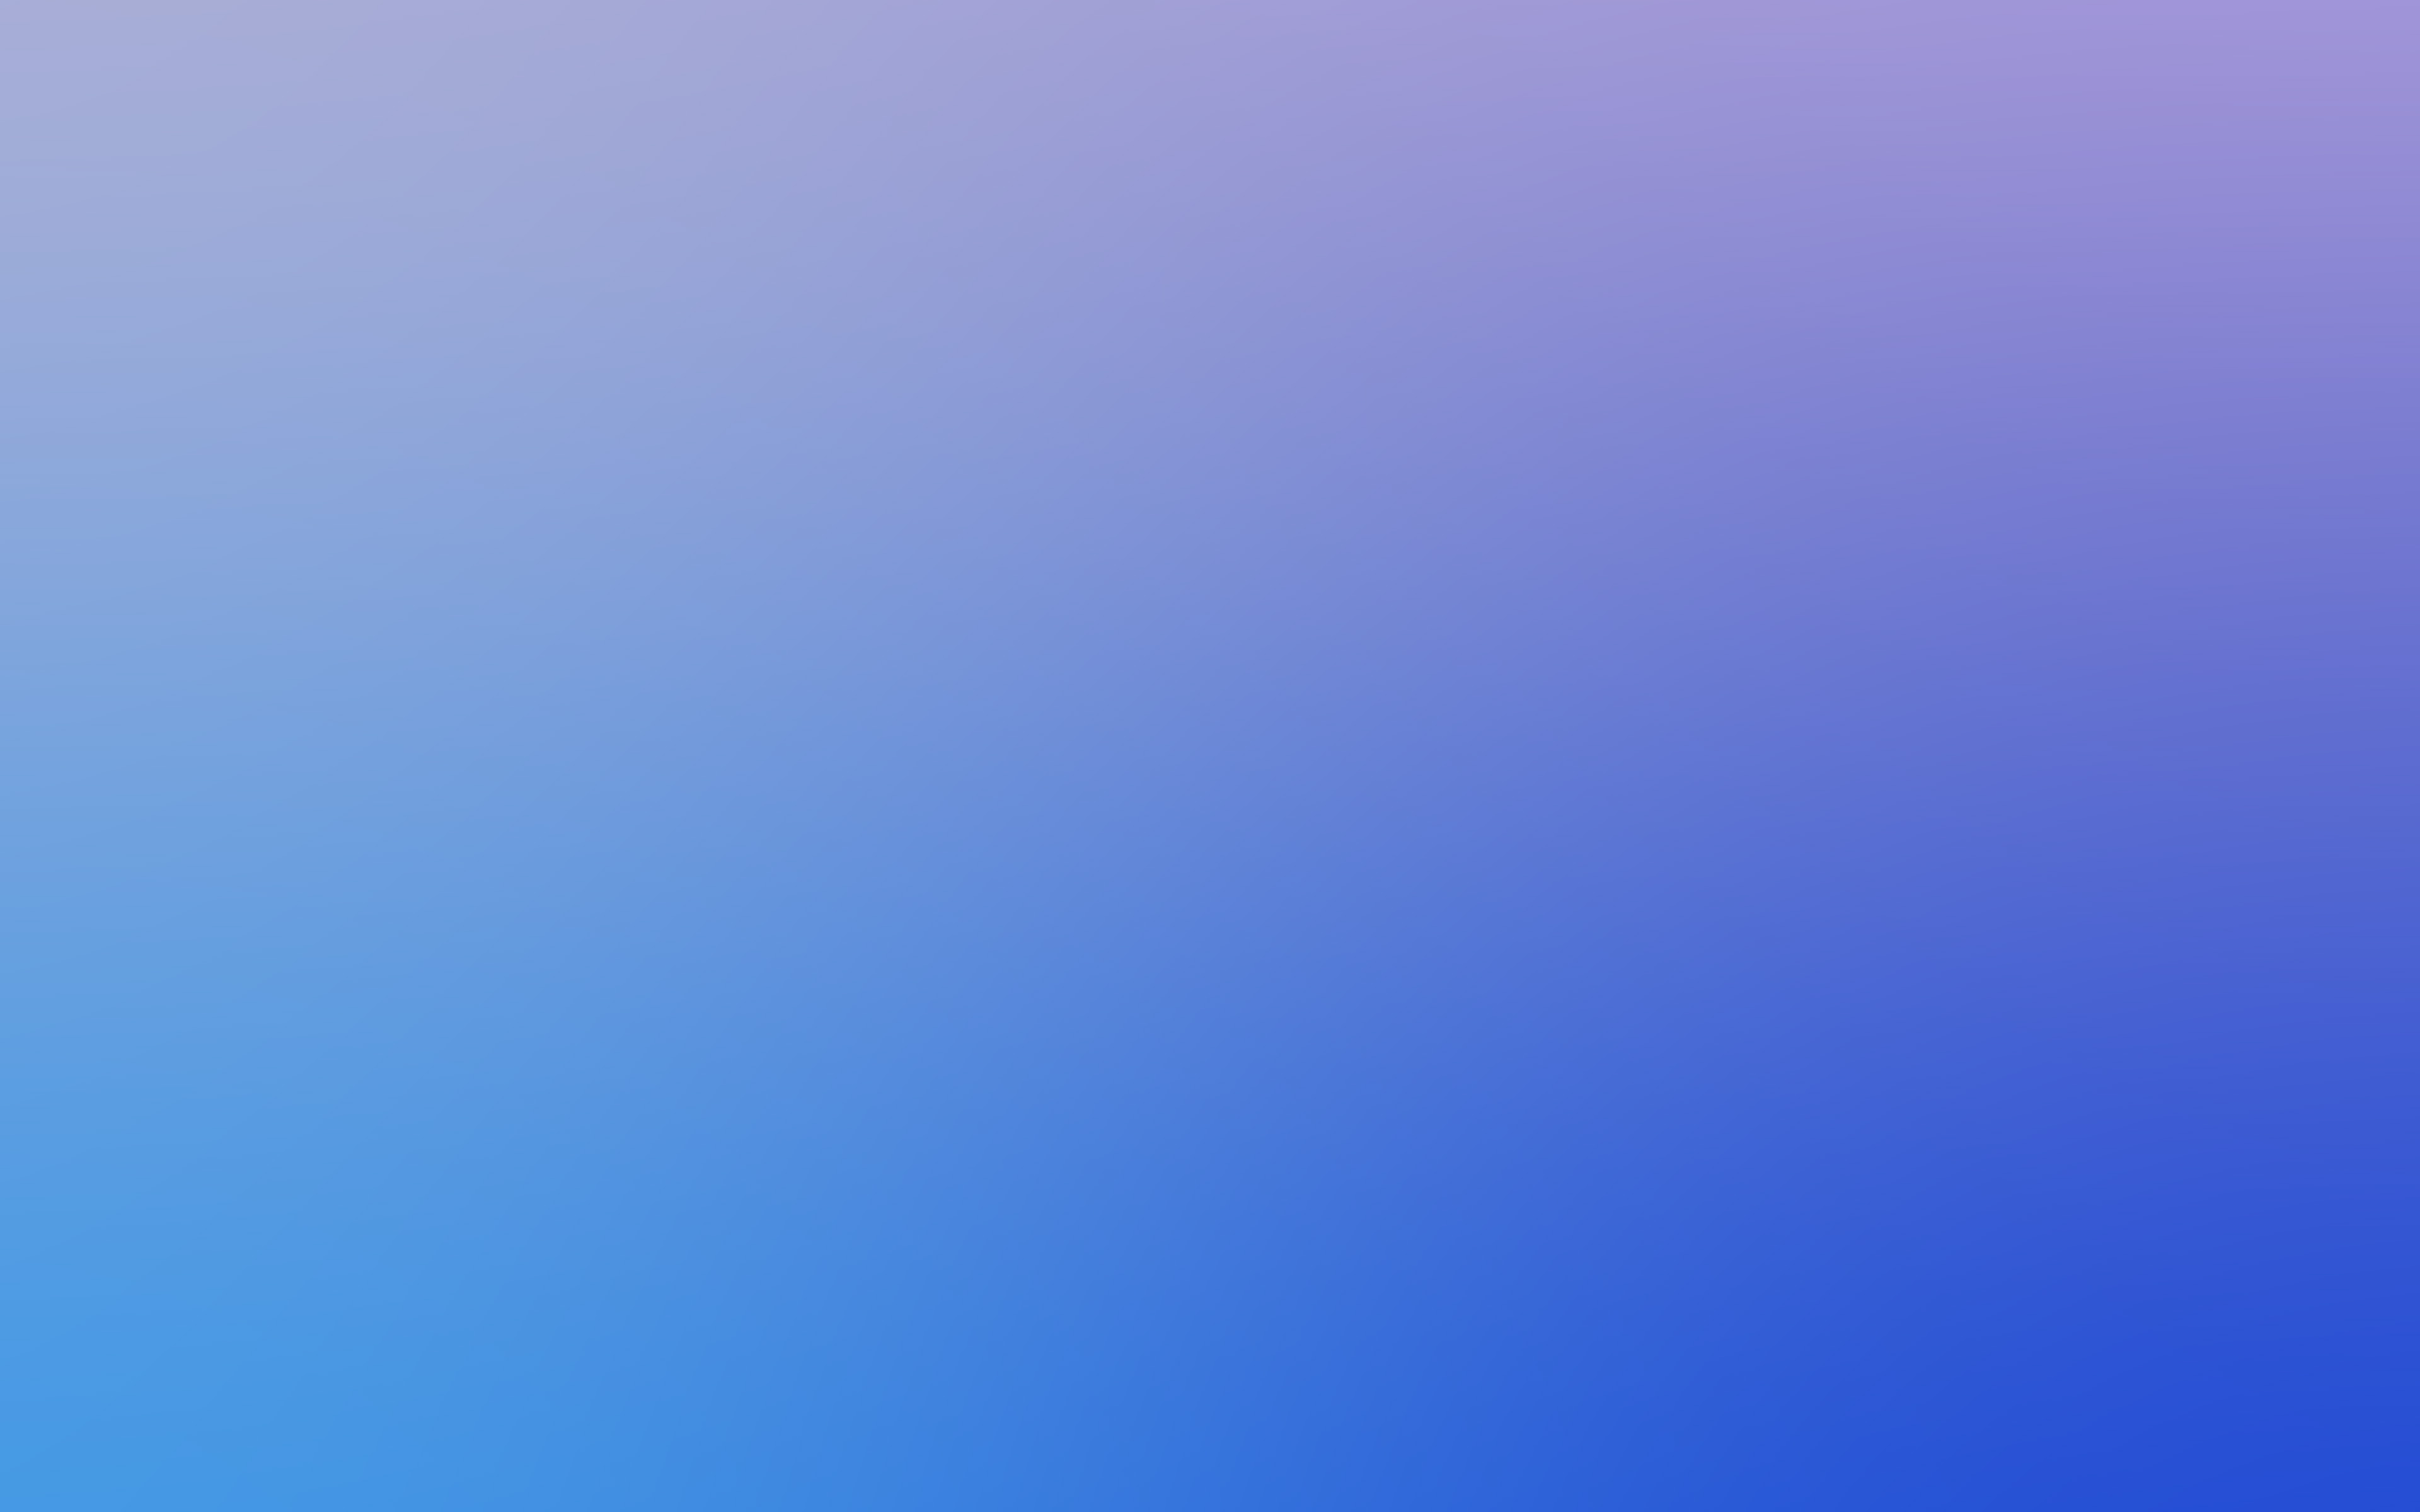 Wallpaper Blue blur gradient